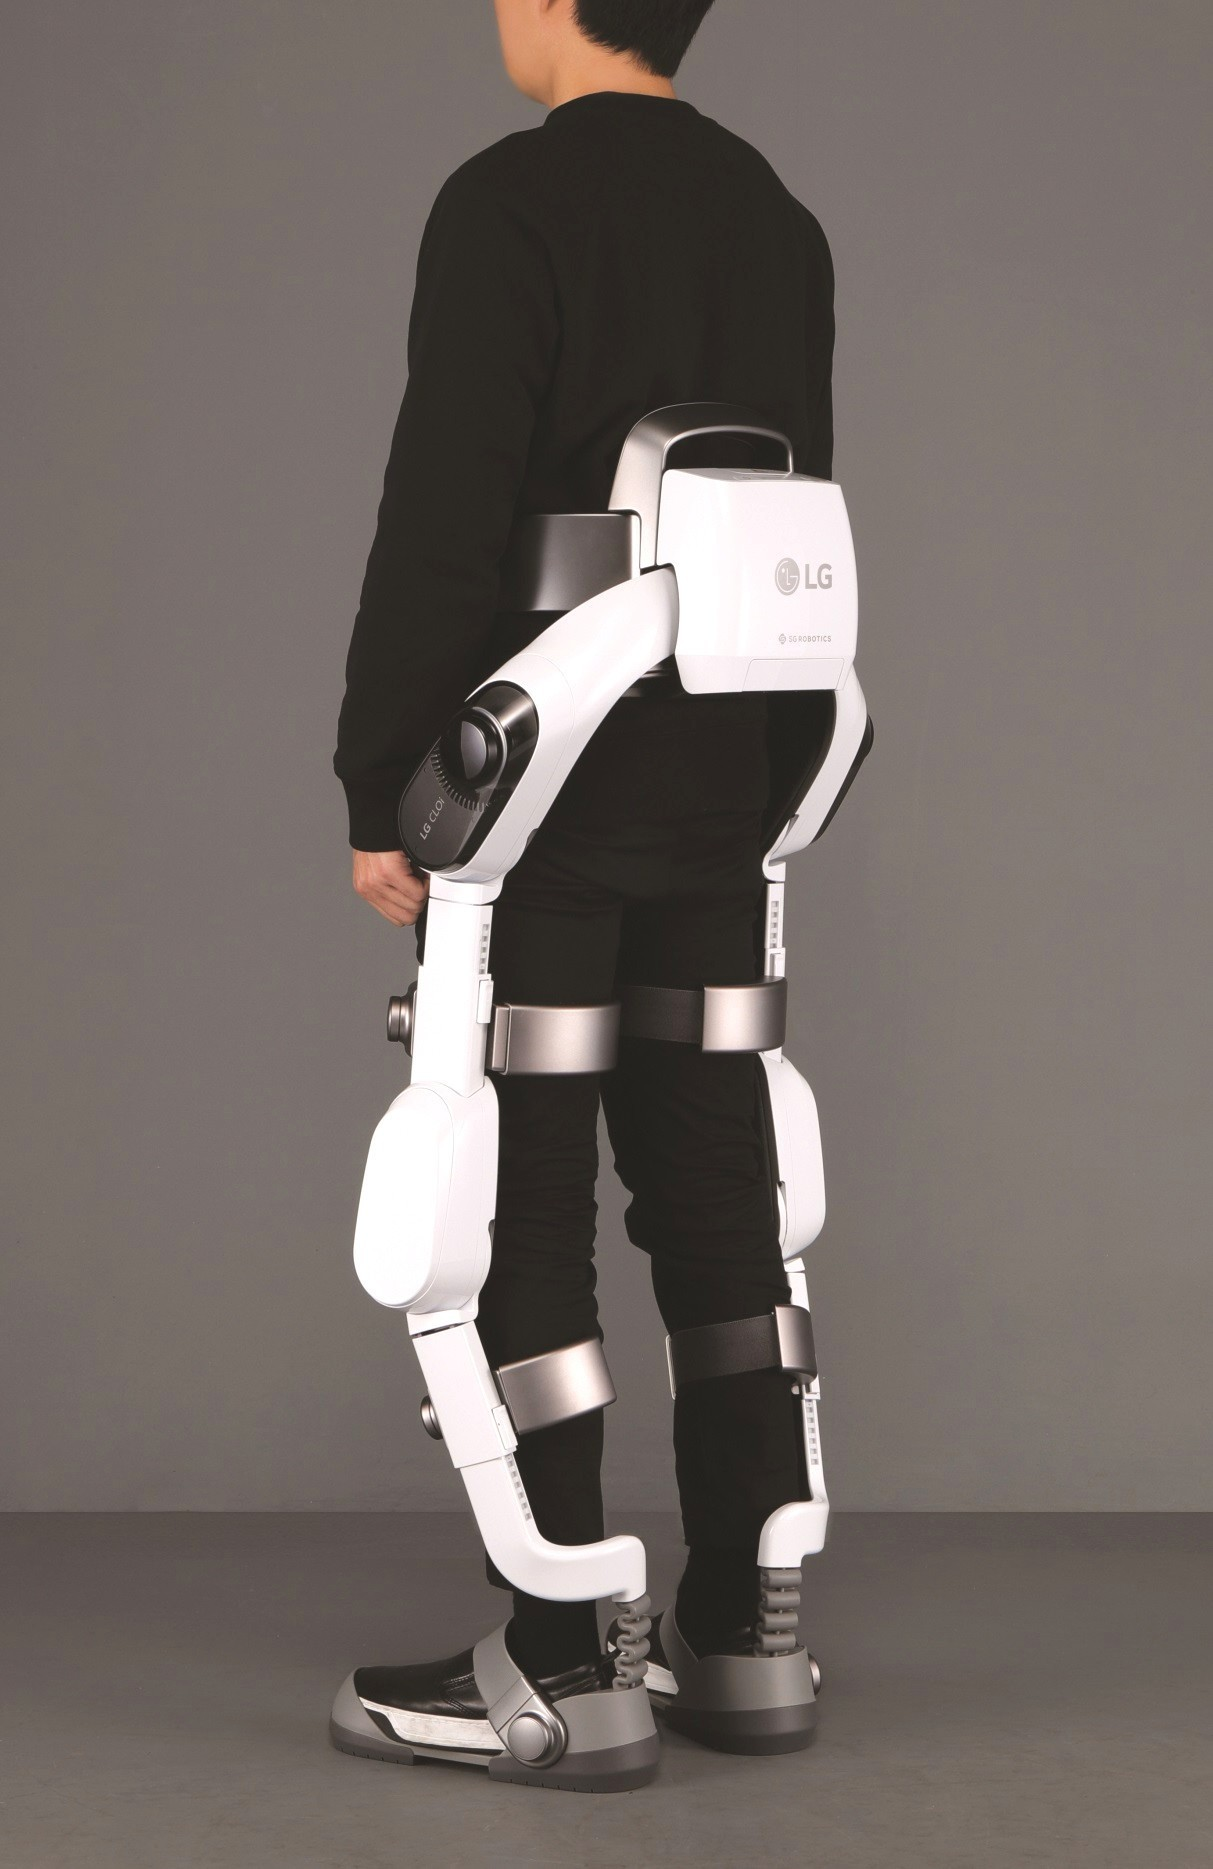 Lg Introduces Wearable Robot Exoskeleton At Ifa 2018